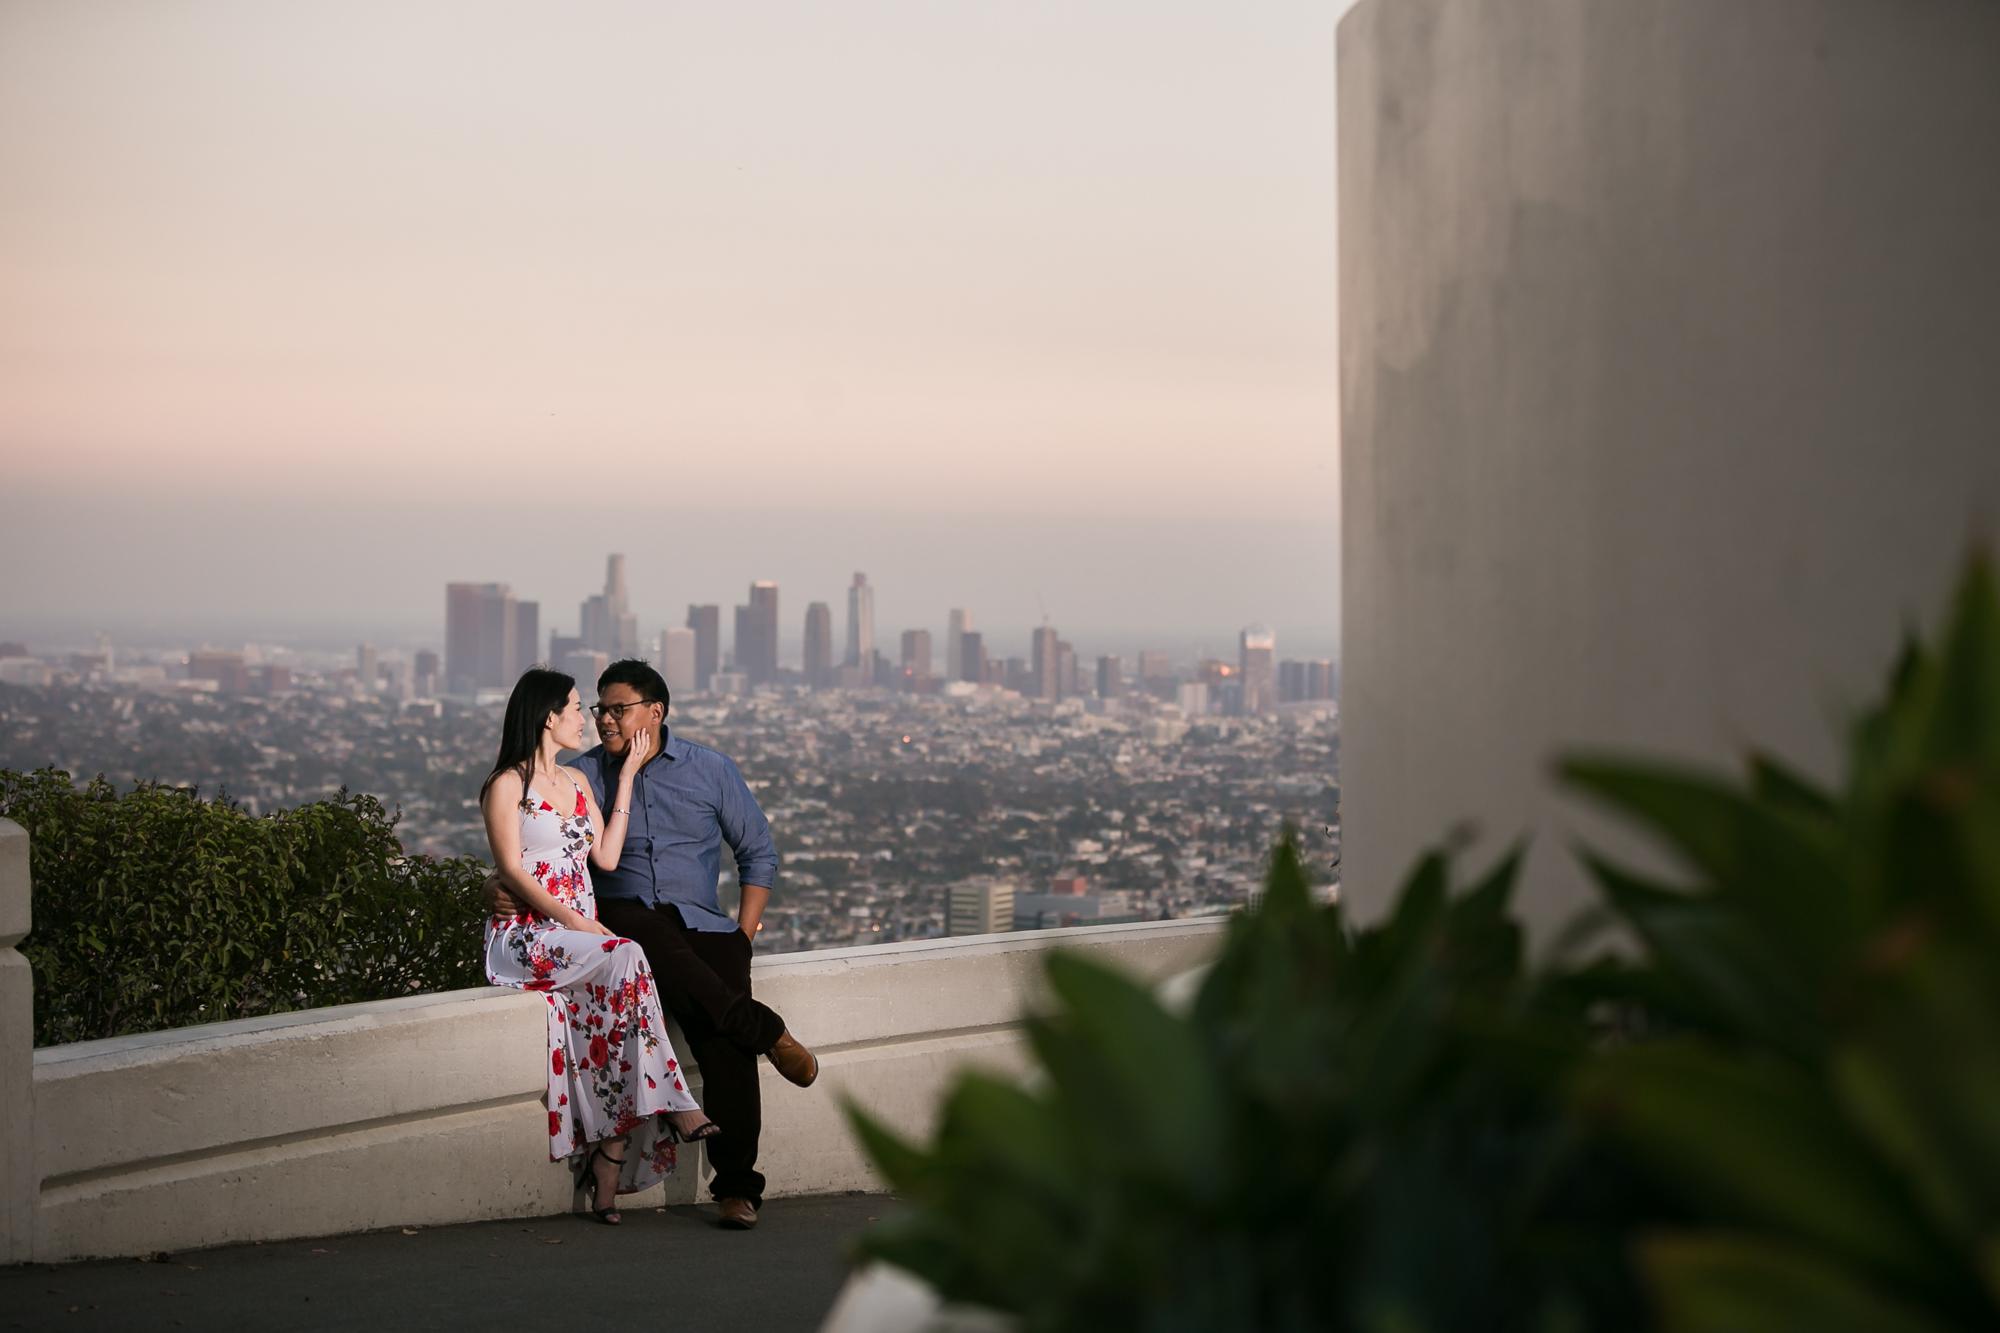 CM-Pasadena_City-Hall-Engagement-Photography-0007.jpg